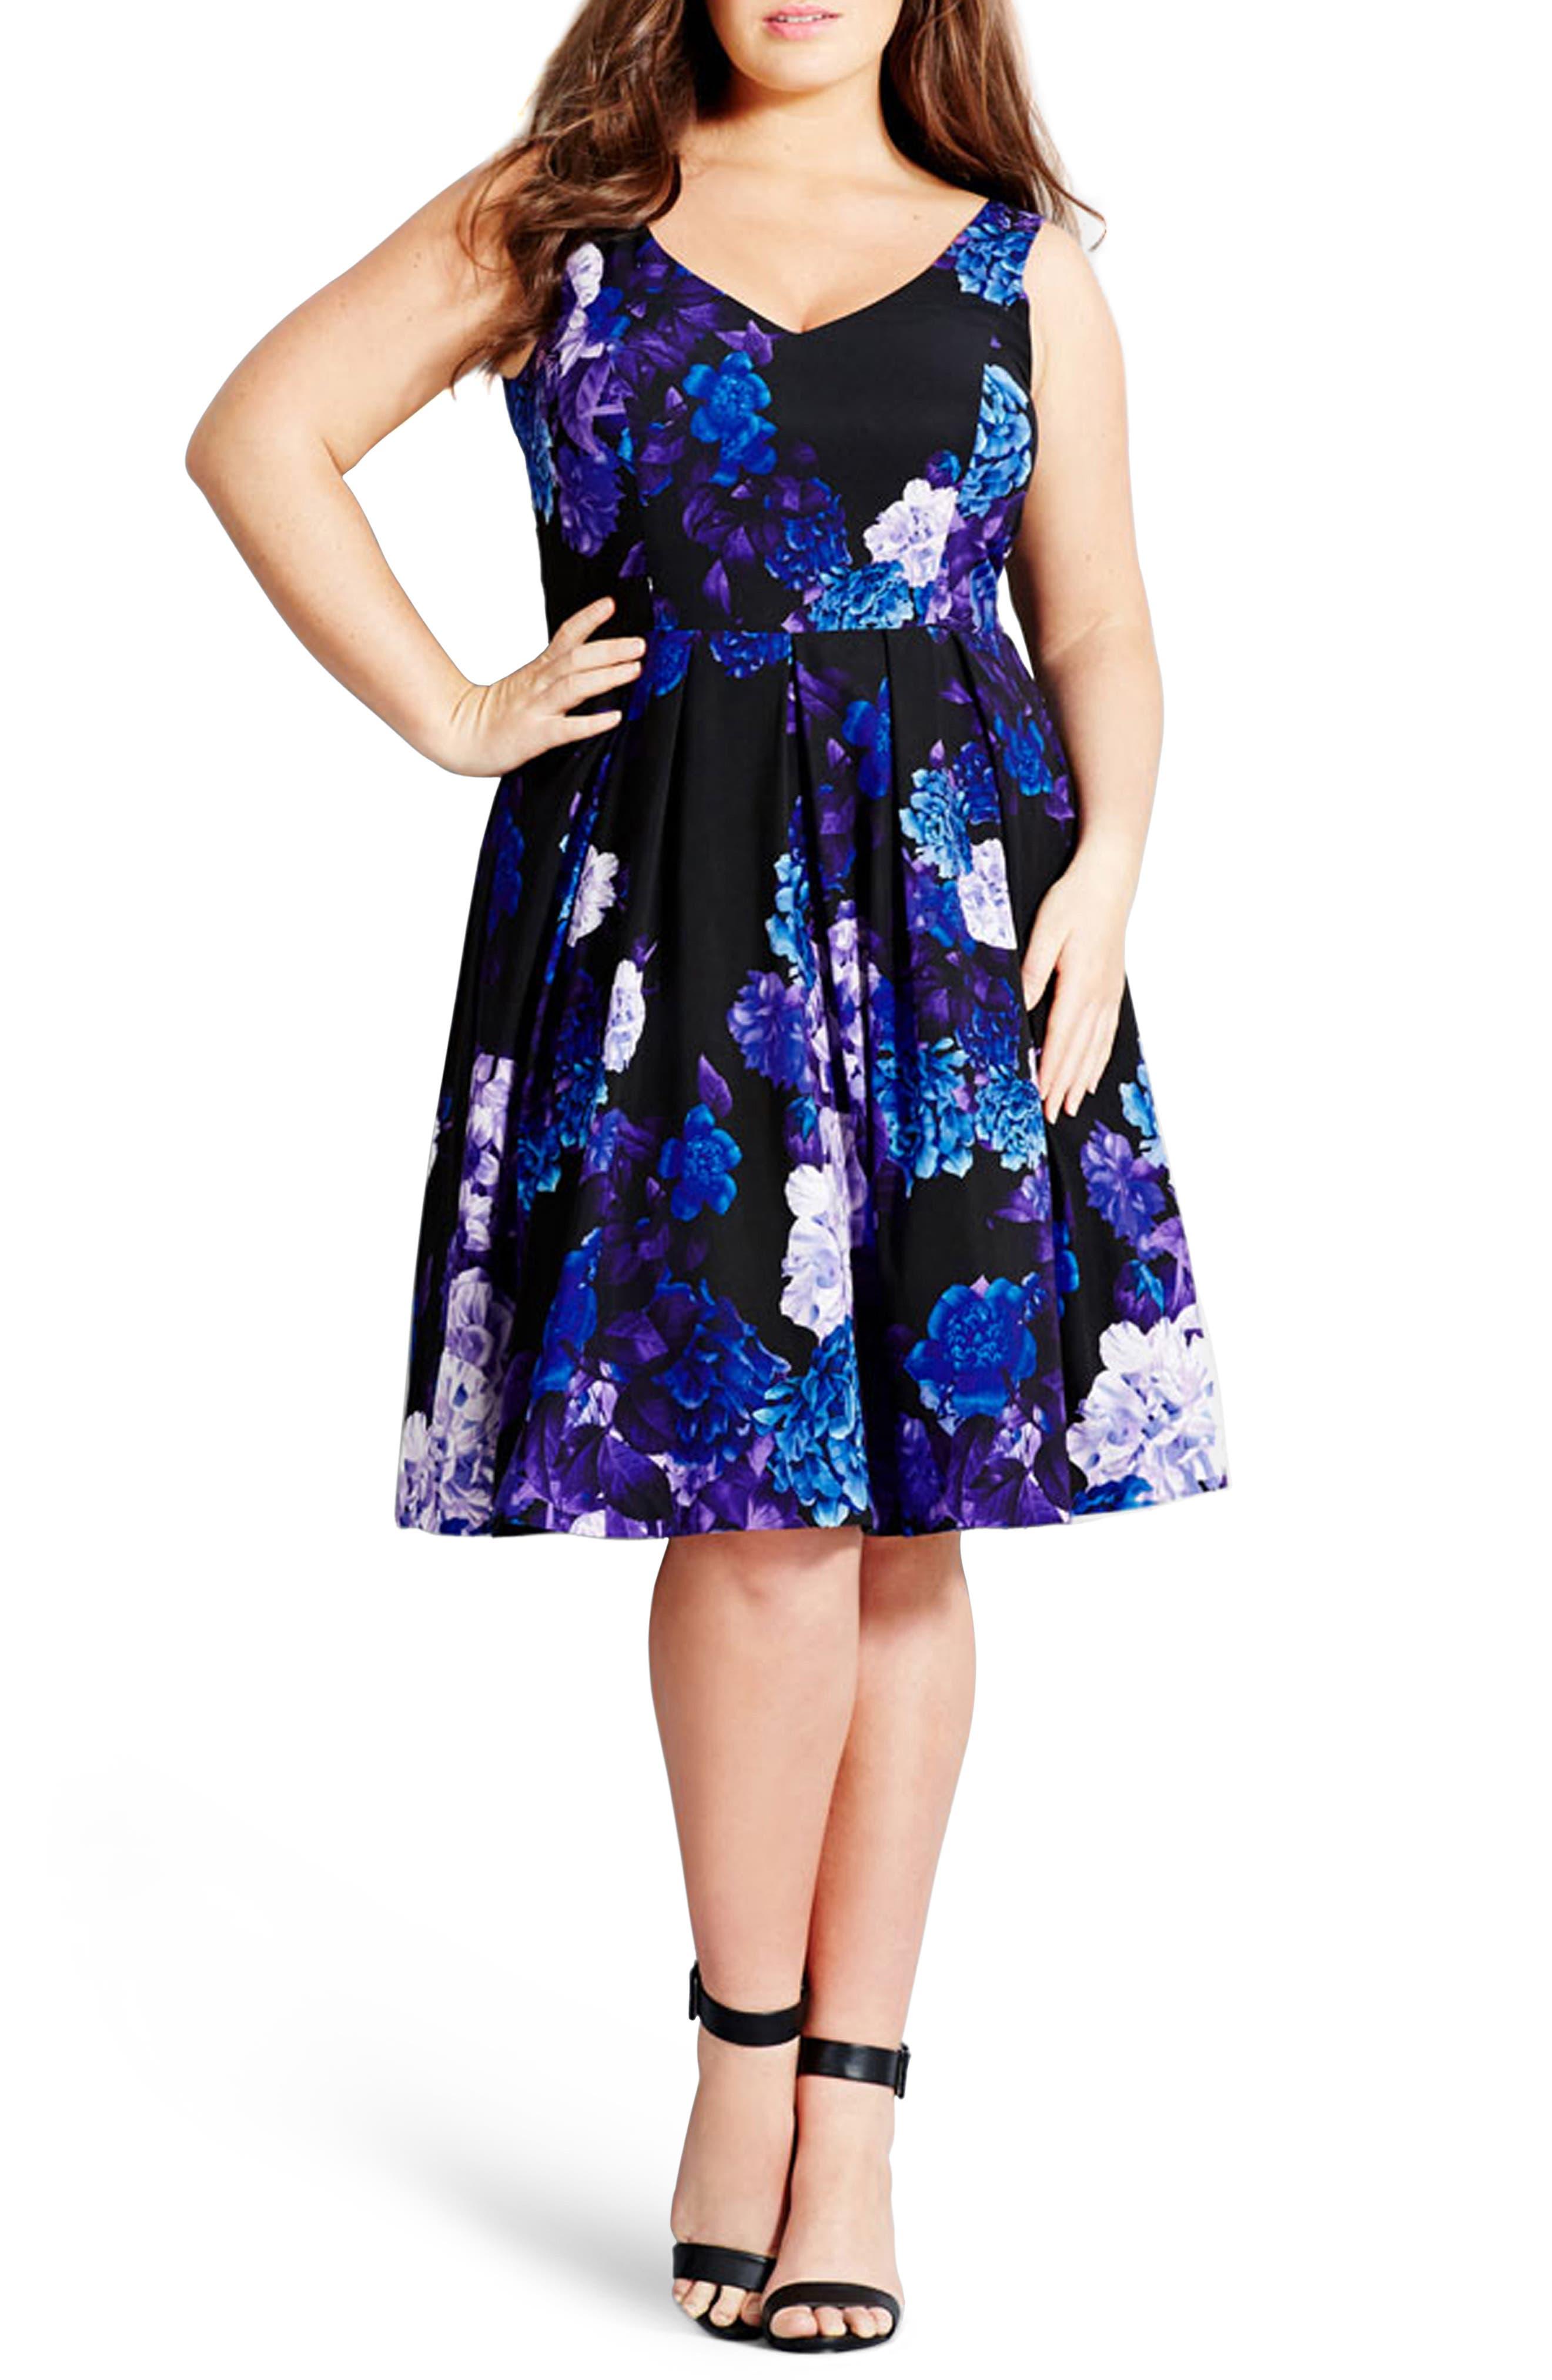 Hydrangea Print Dress,                             Main thumbnail 1, color,                             BLACK